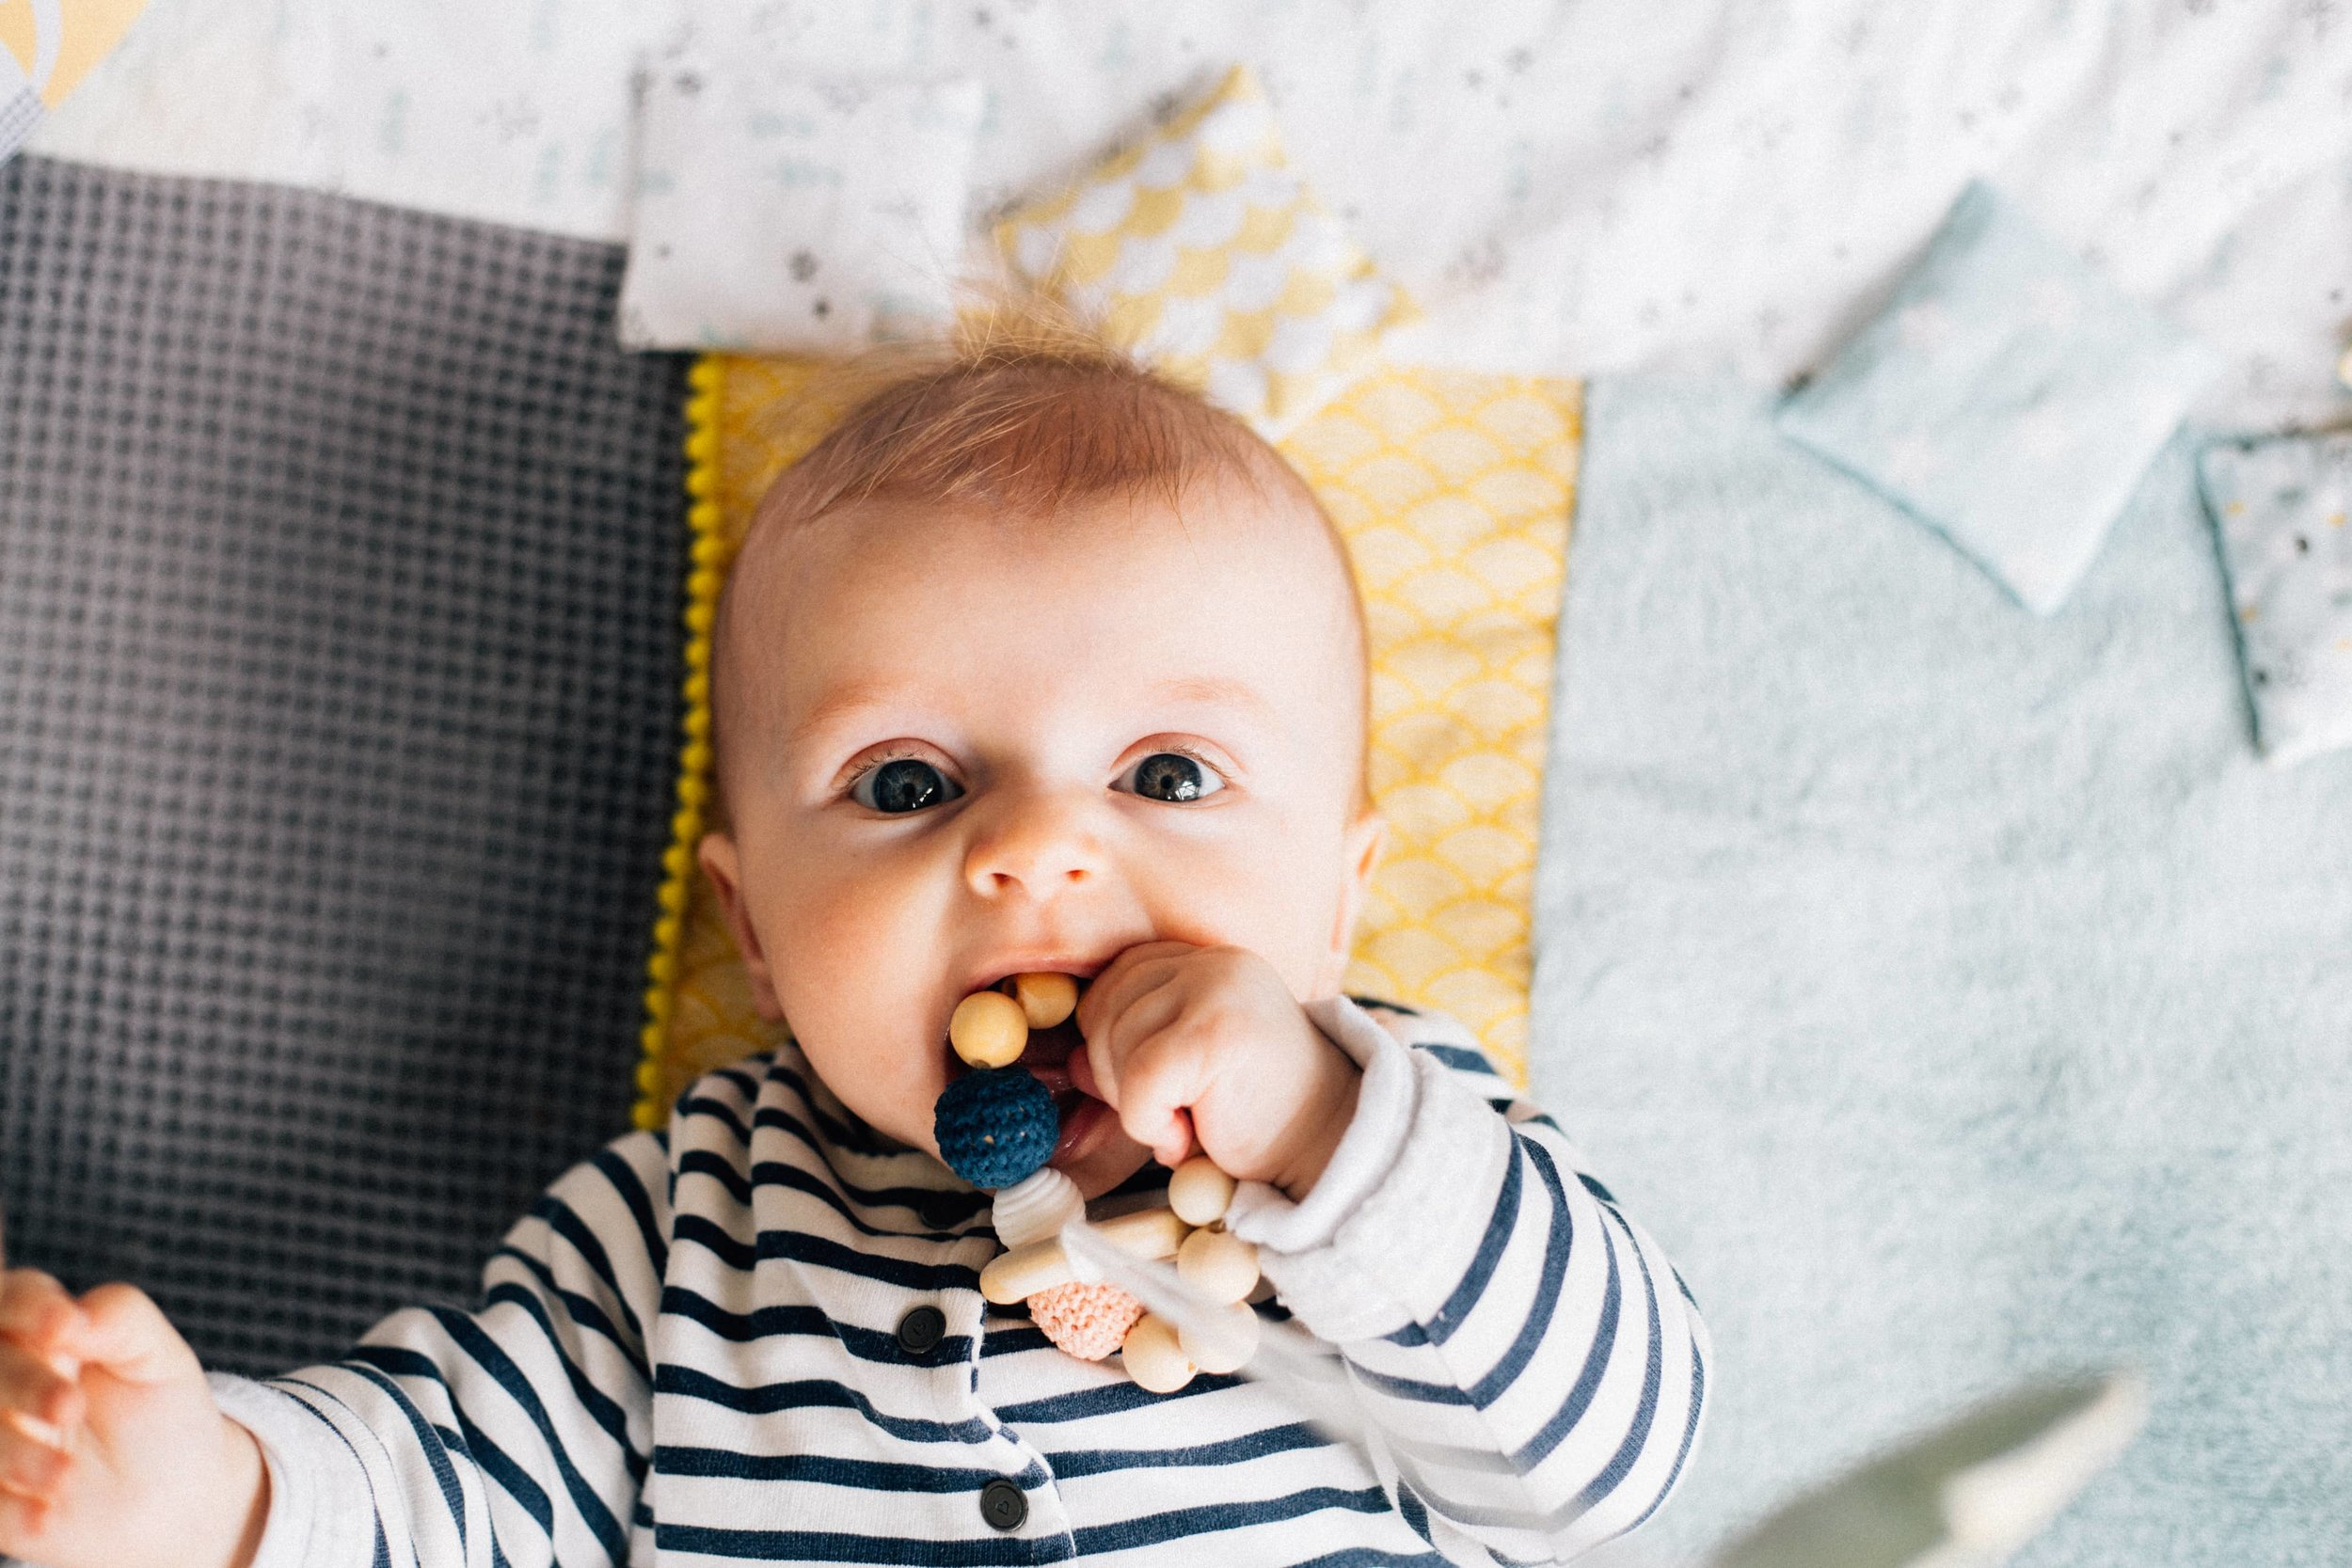 seance-photo-bebe-domicile-bordeaux8.jpg